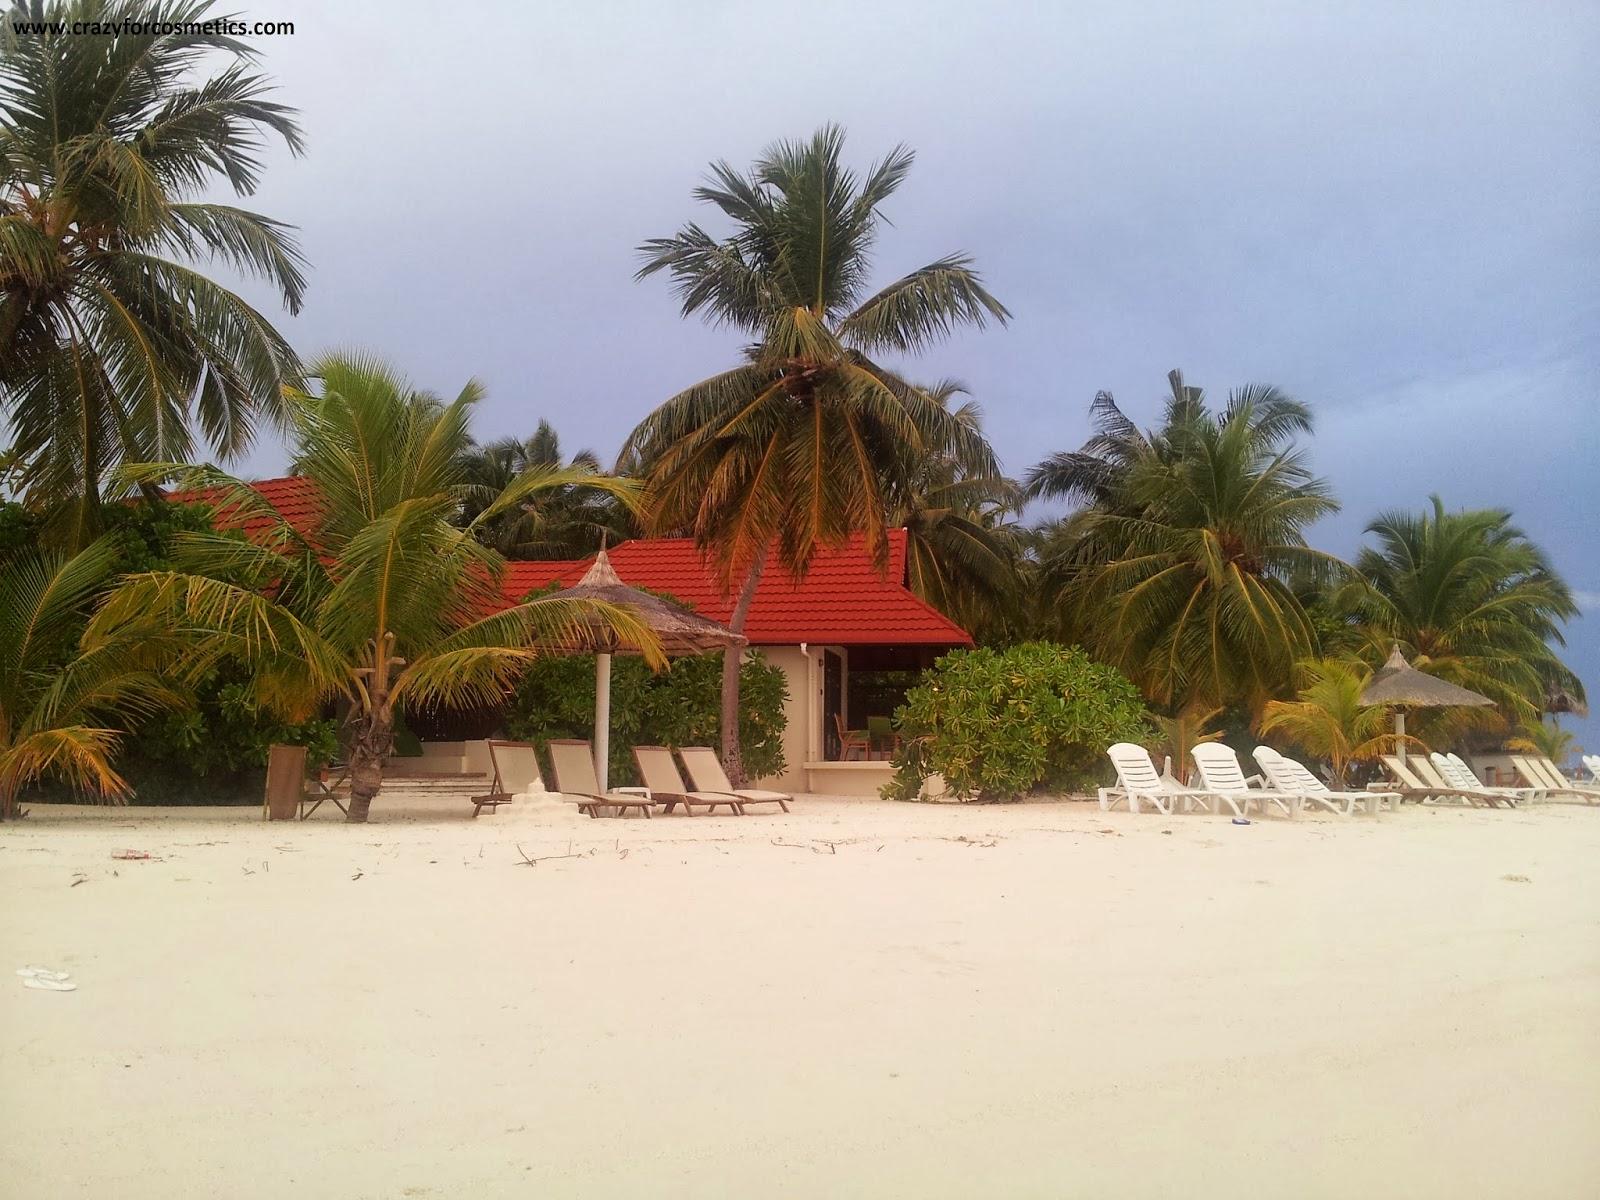 Kurumba Maldives Deluxe Beach front Bungalow